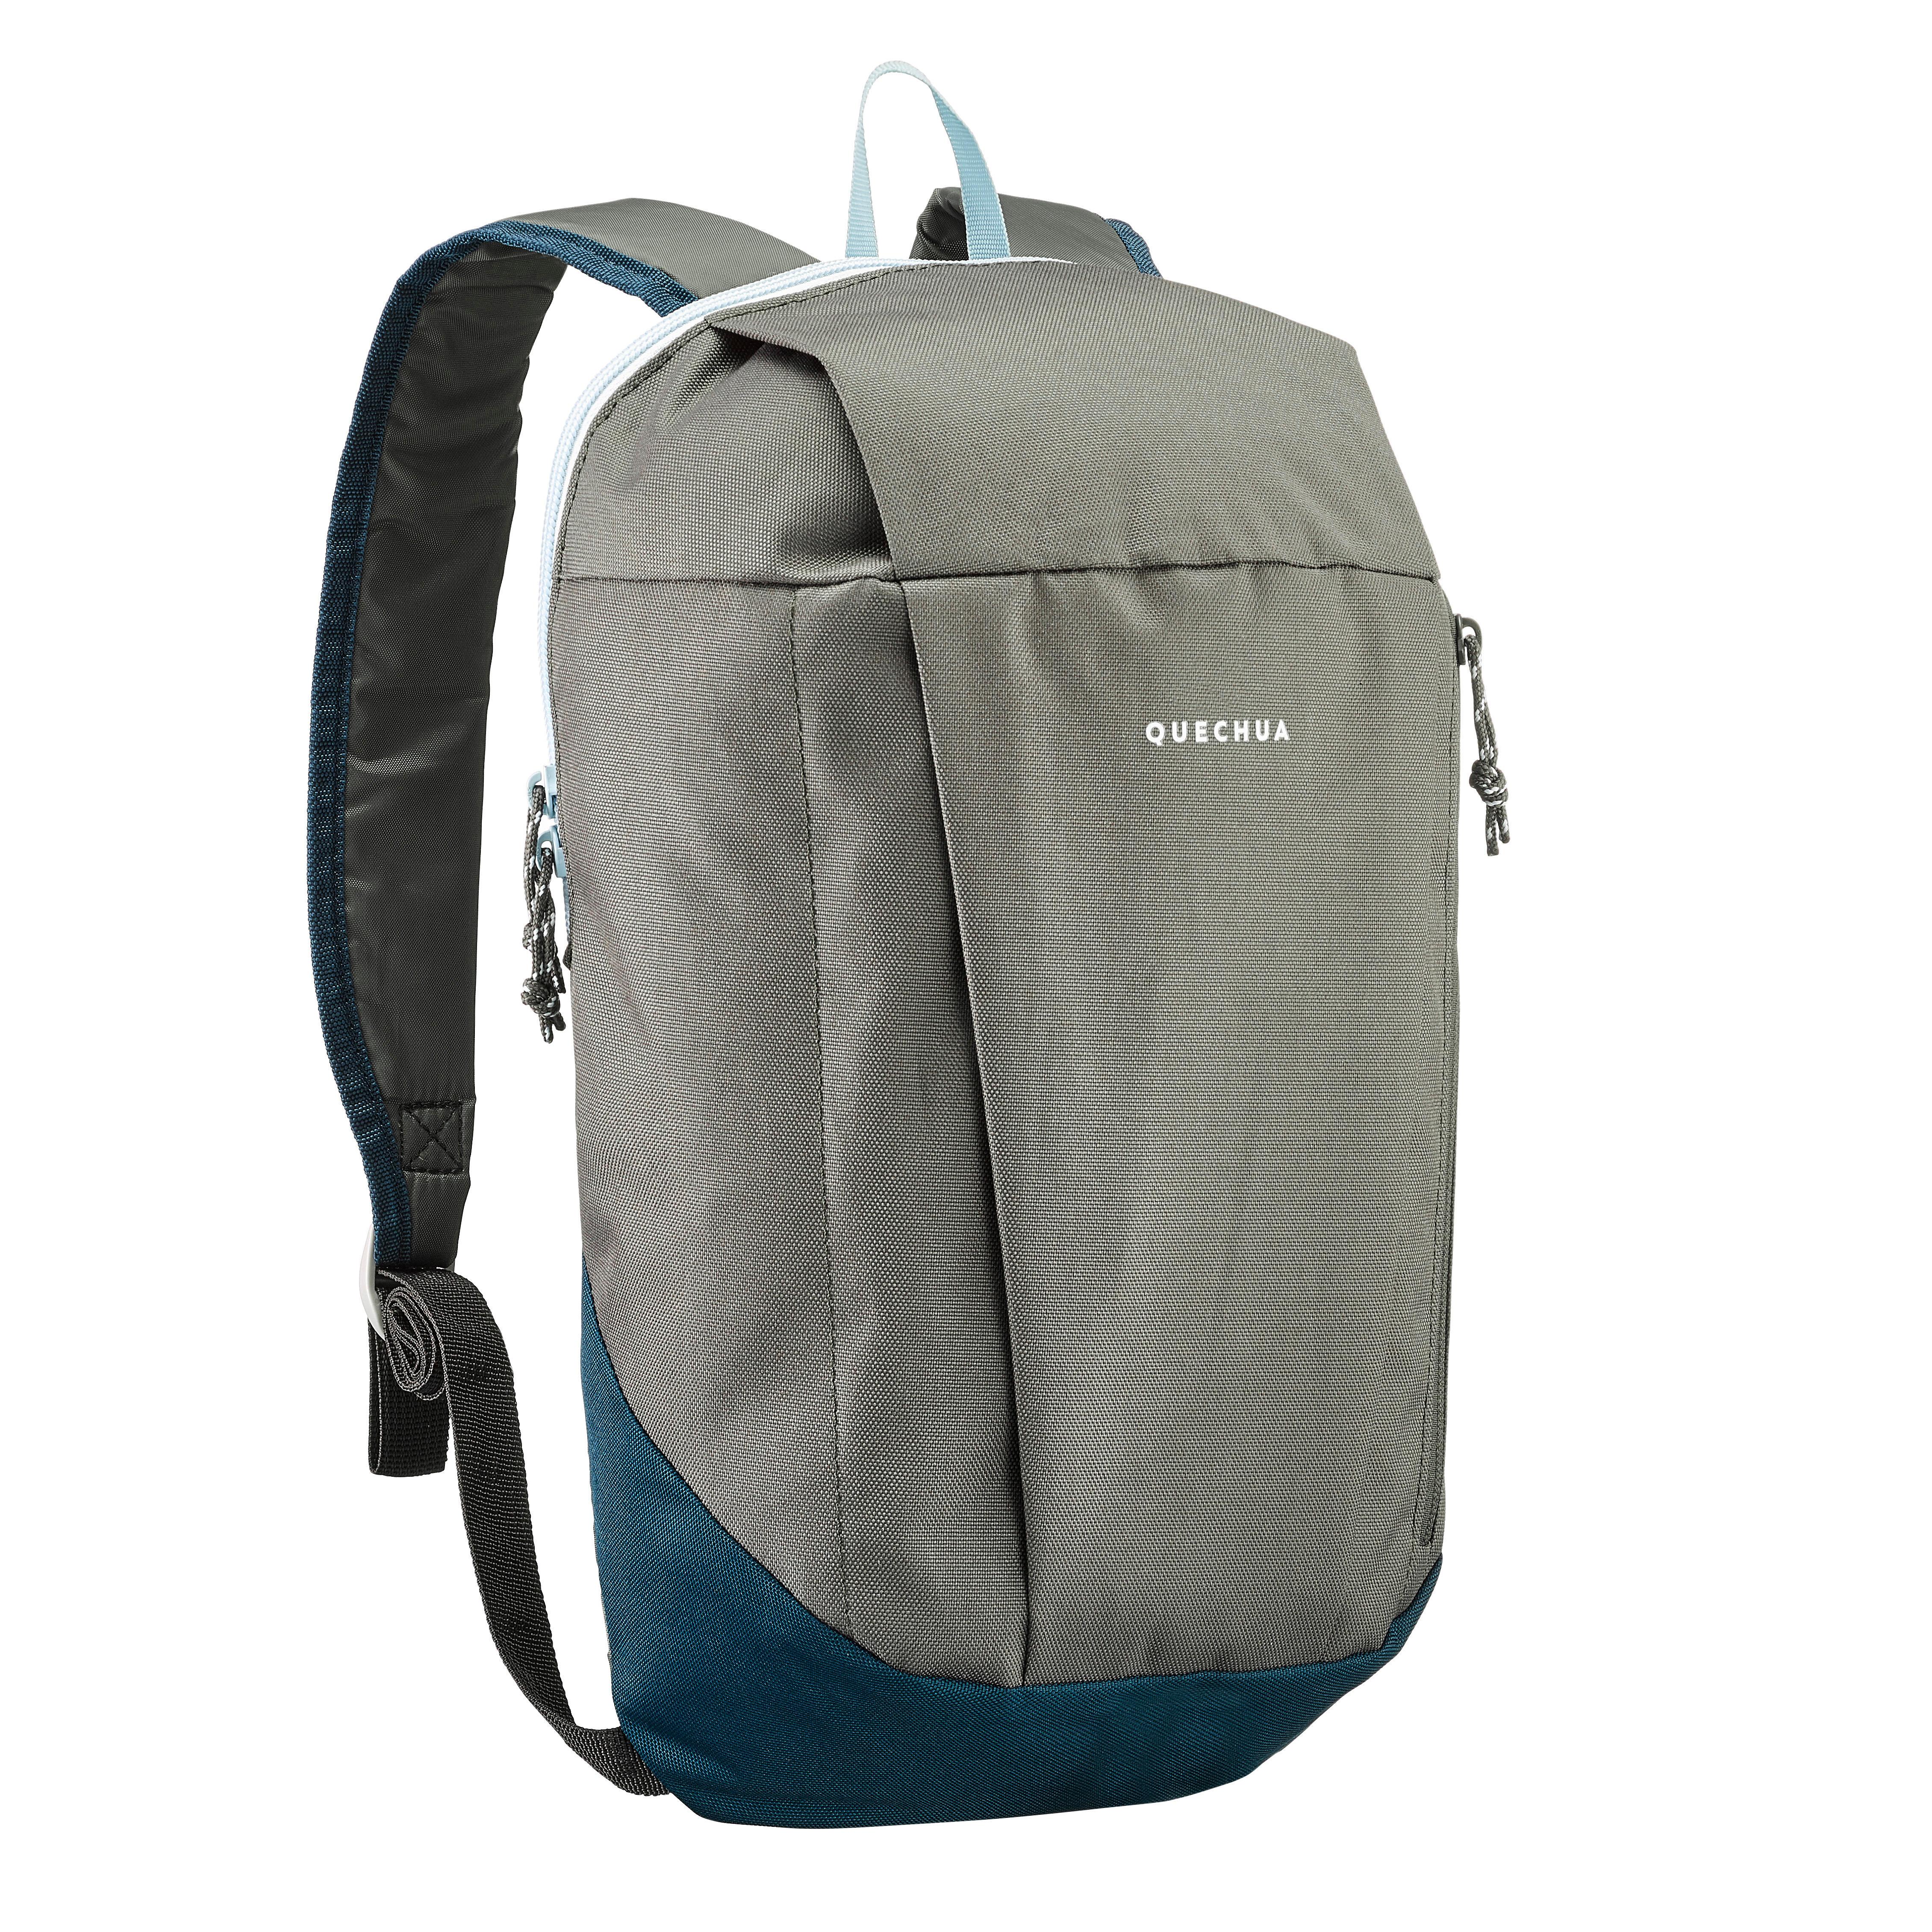 Toolpak backpack bahco s103 socket set